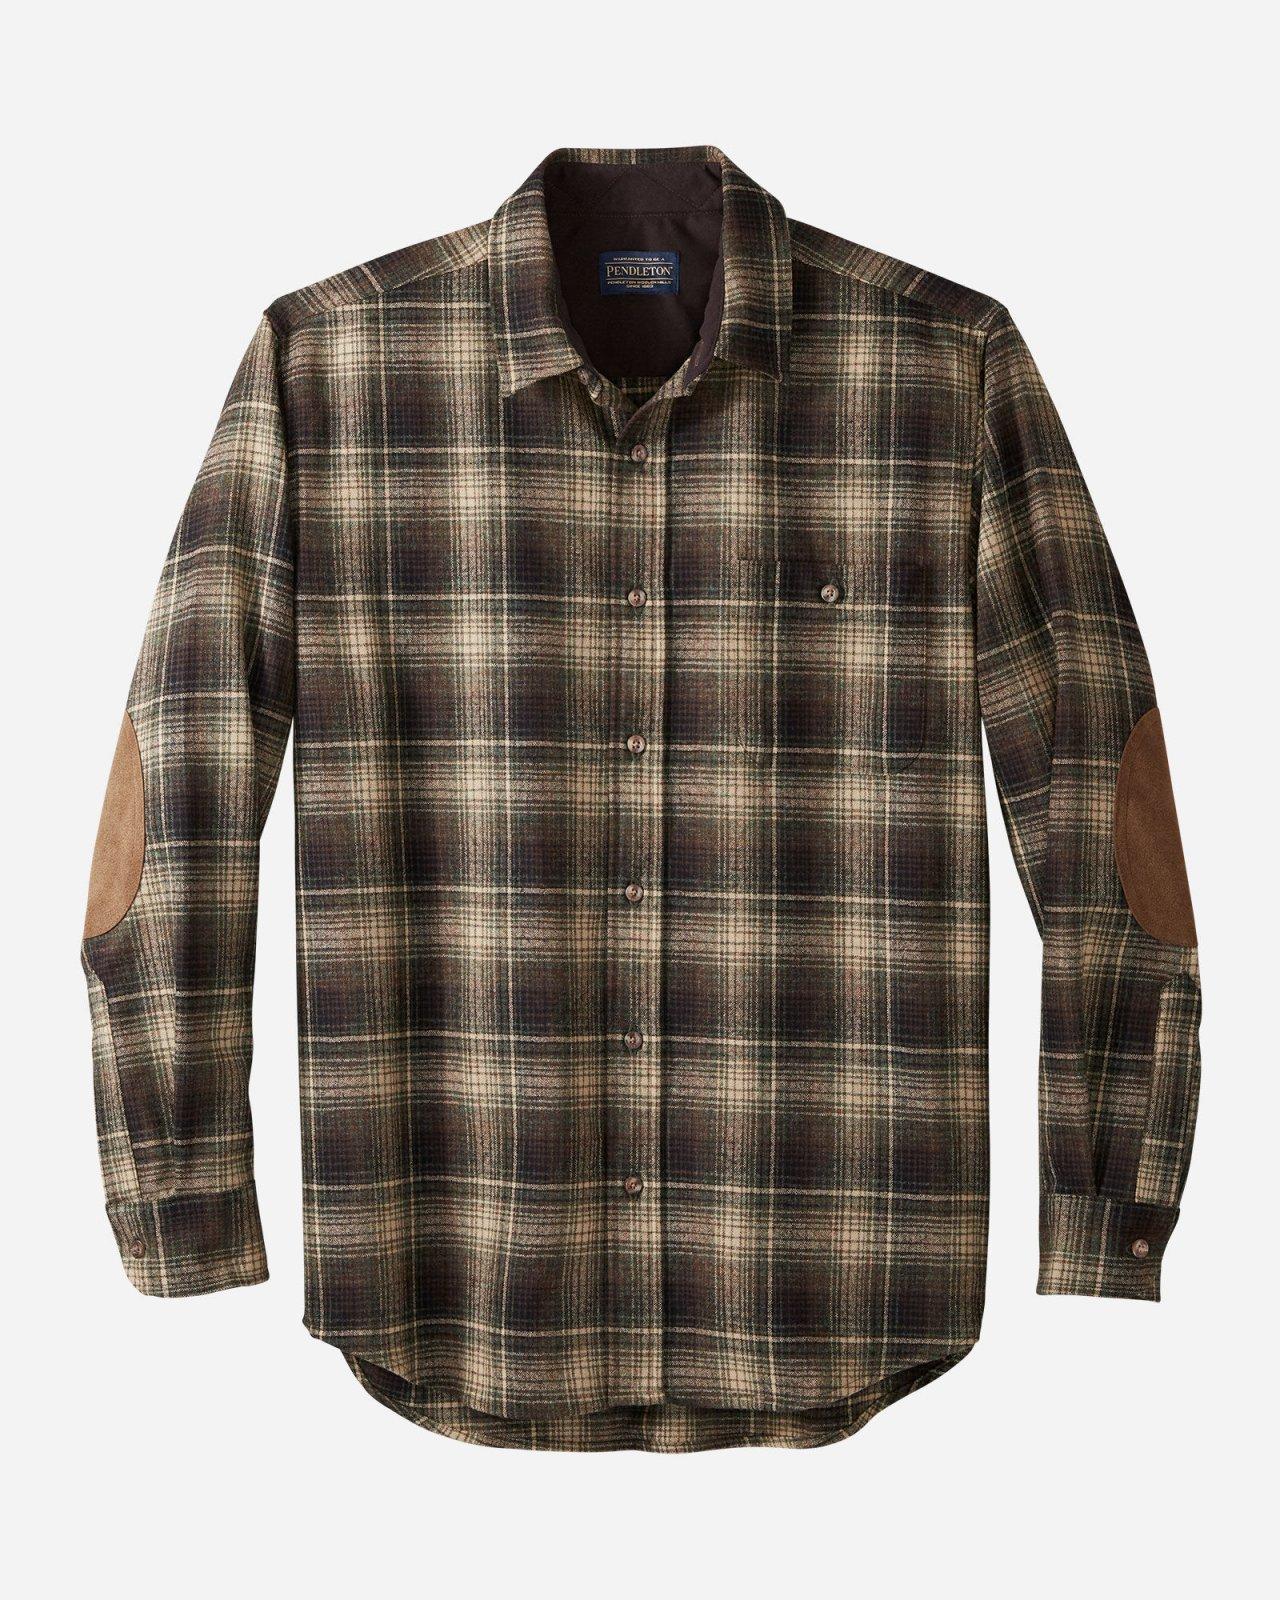 M's Pendleton Wool Elbow Patch Trail Shirt - Tan Green Plaid